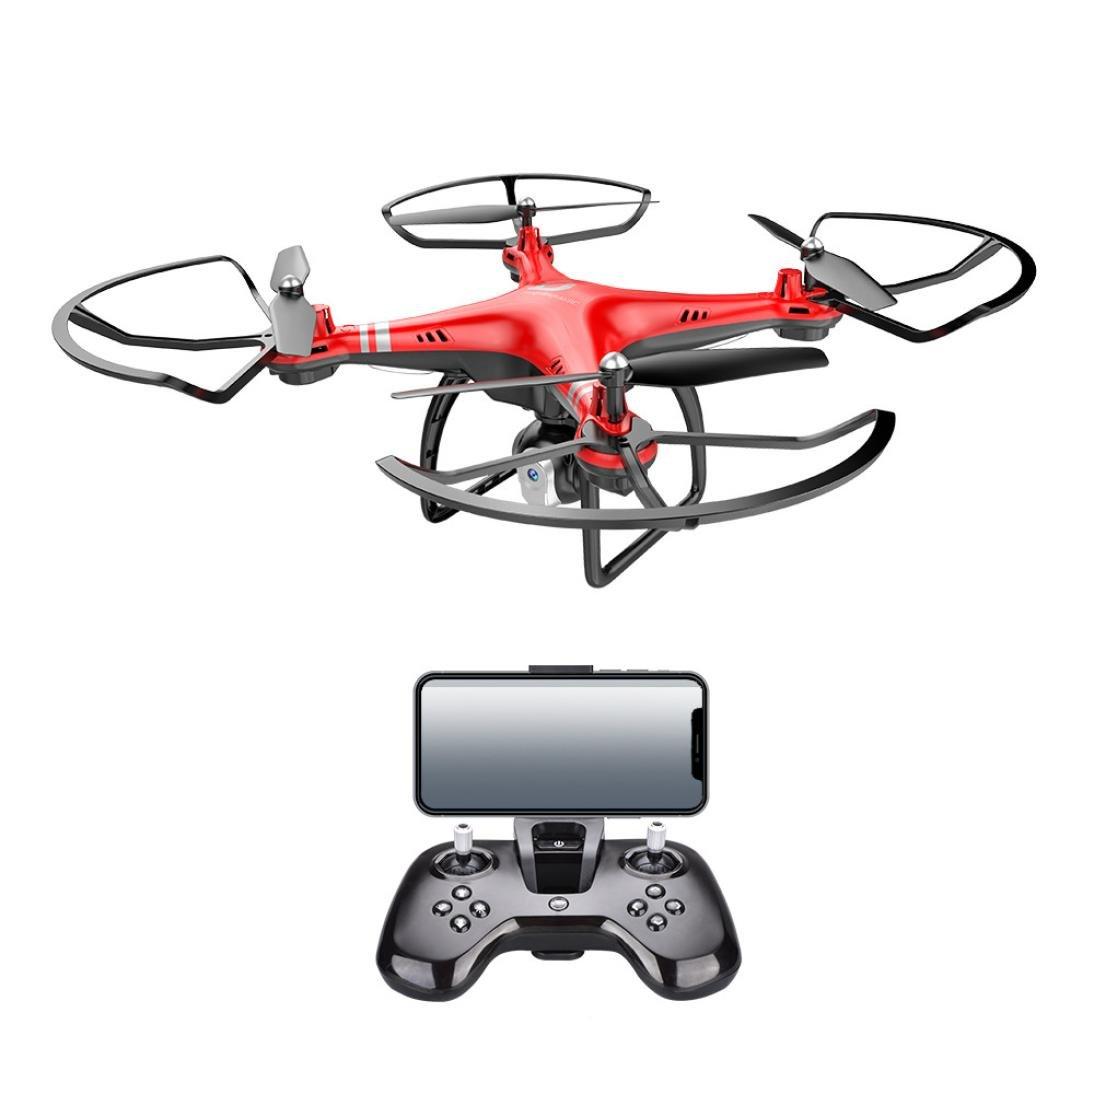 GJKK x8 2.4G RC Quadcopter Strom Anpassung 0.3MP HD Kamera RC Drone FPV Ferngesteuerte Flugzeuge Mini Drone Quadcopter Drone Fliegendes Spielzeug Tragbare Drohne Draussen Drohne-Schwarz/Rot (Rot)